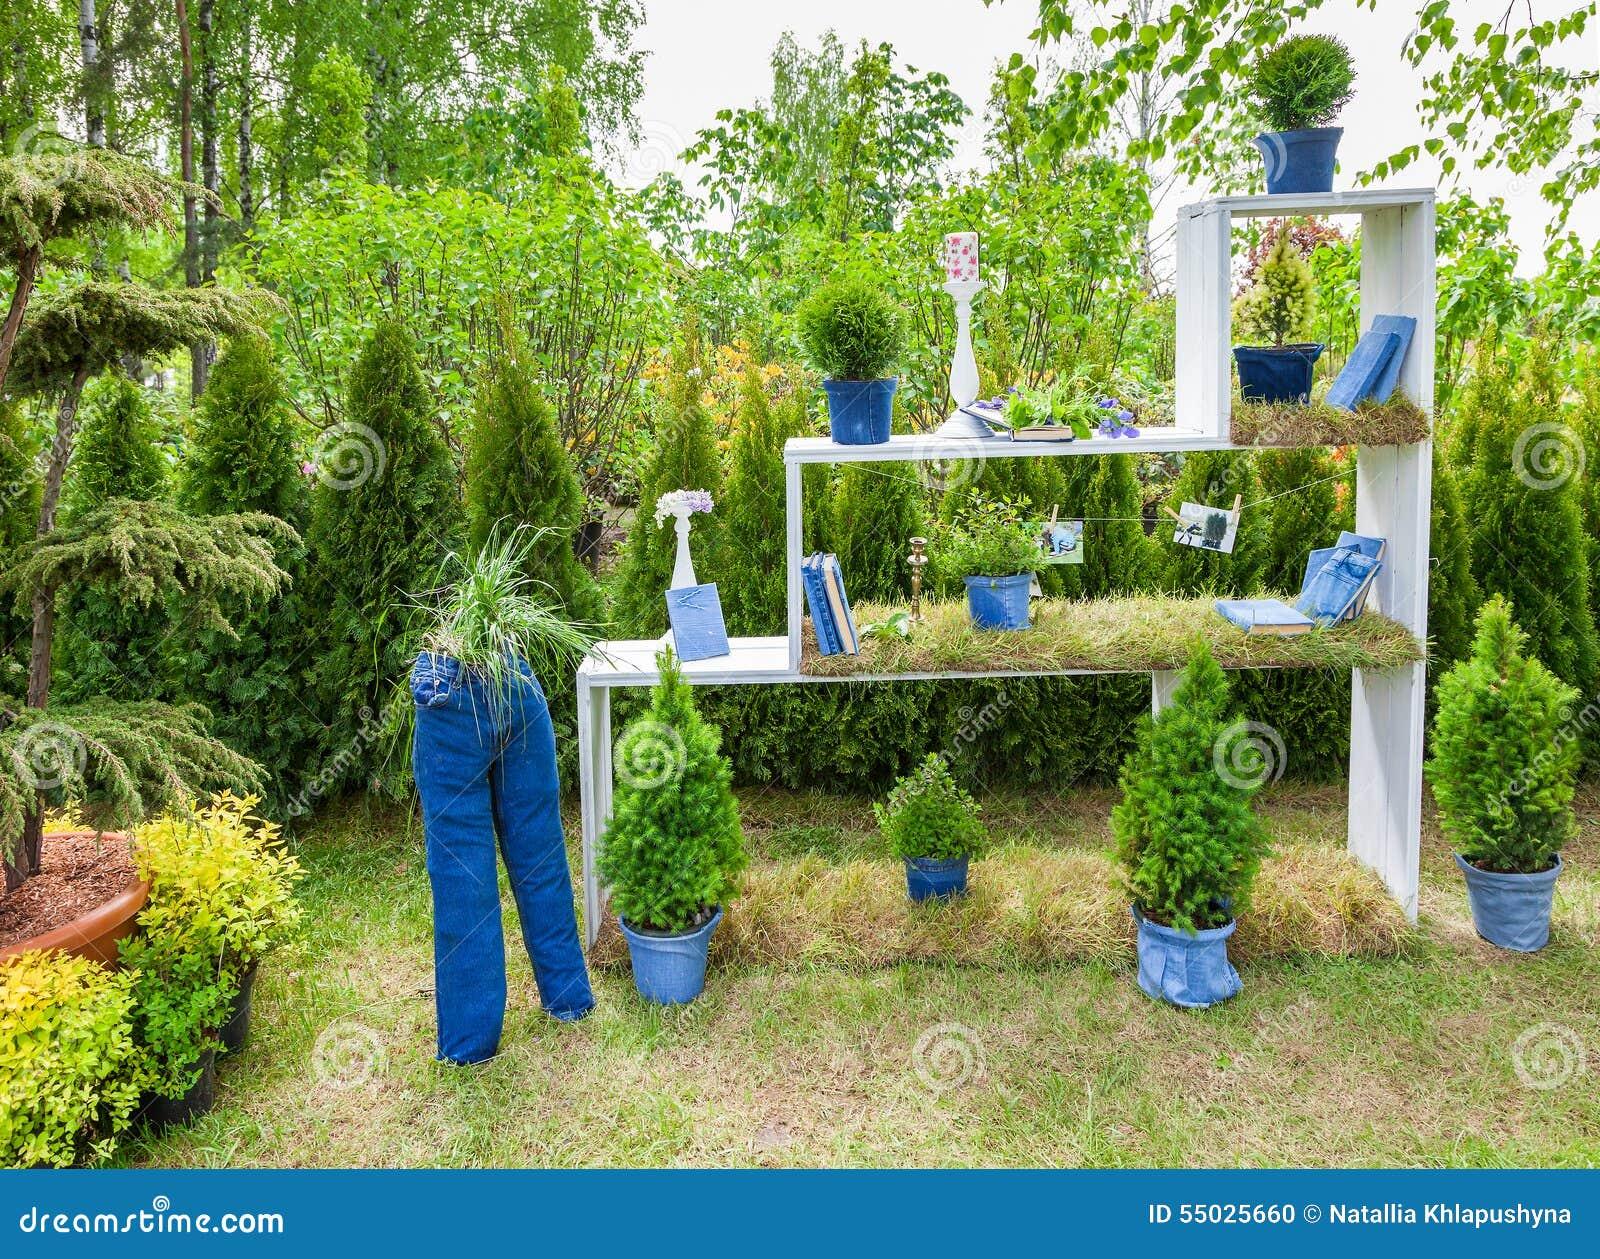 Minsk belarus 23 may 2015 garden design editorial image for Best garden design books 2015